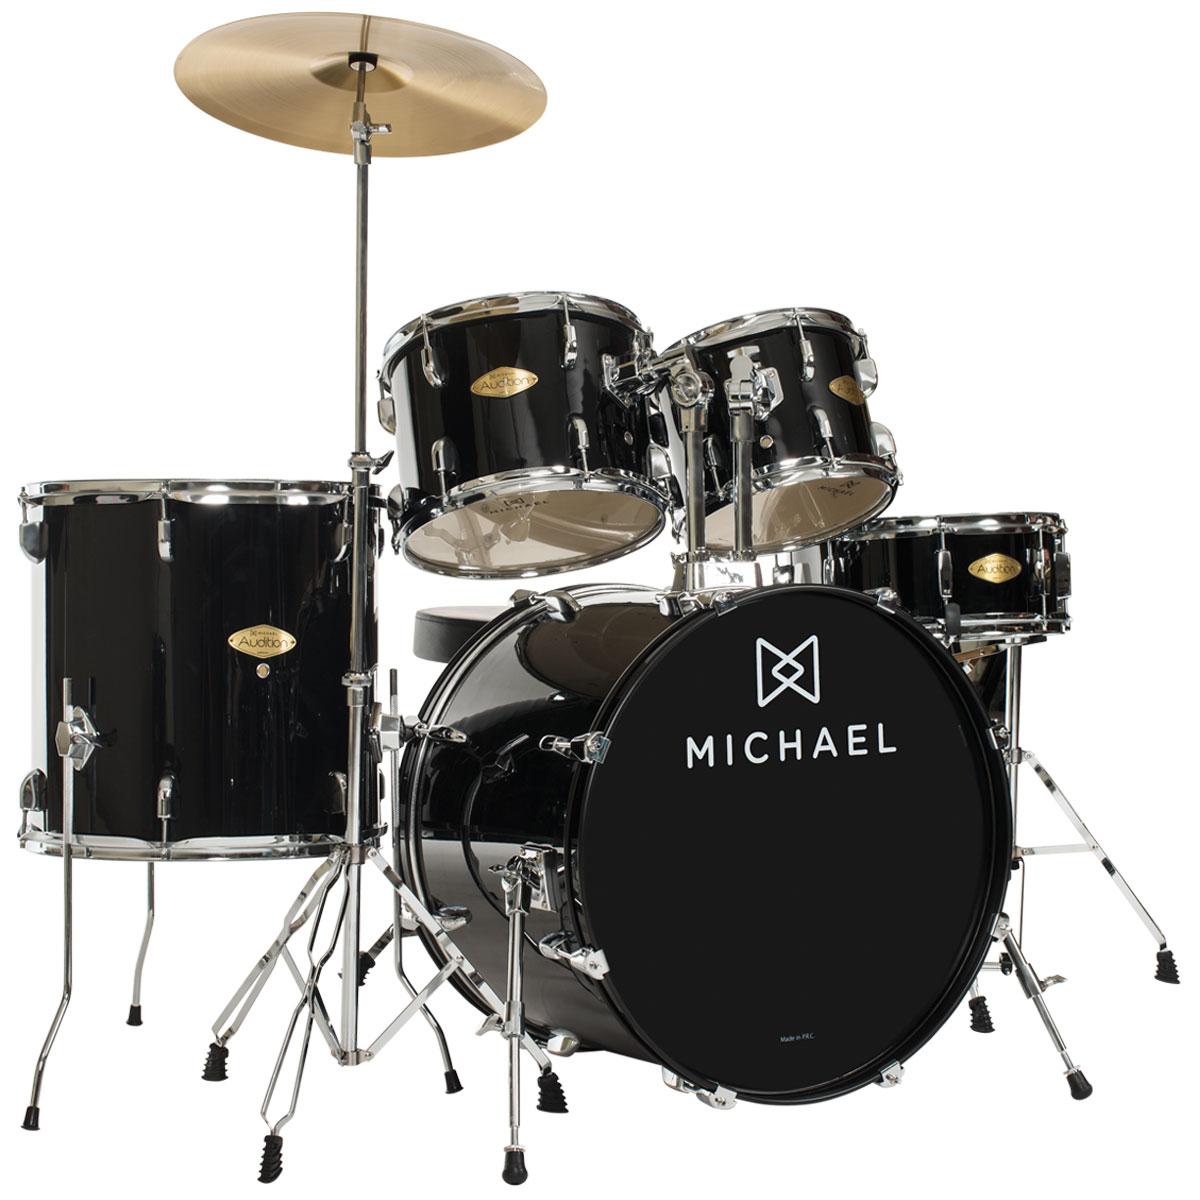 Bateria Acústica Bumbo 20 Pol - Audition DM 827 BK Michael